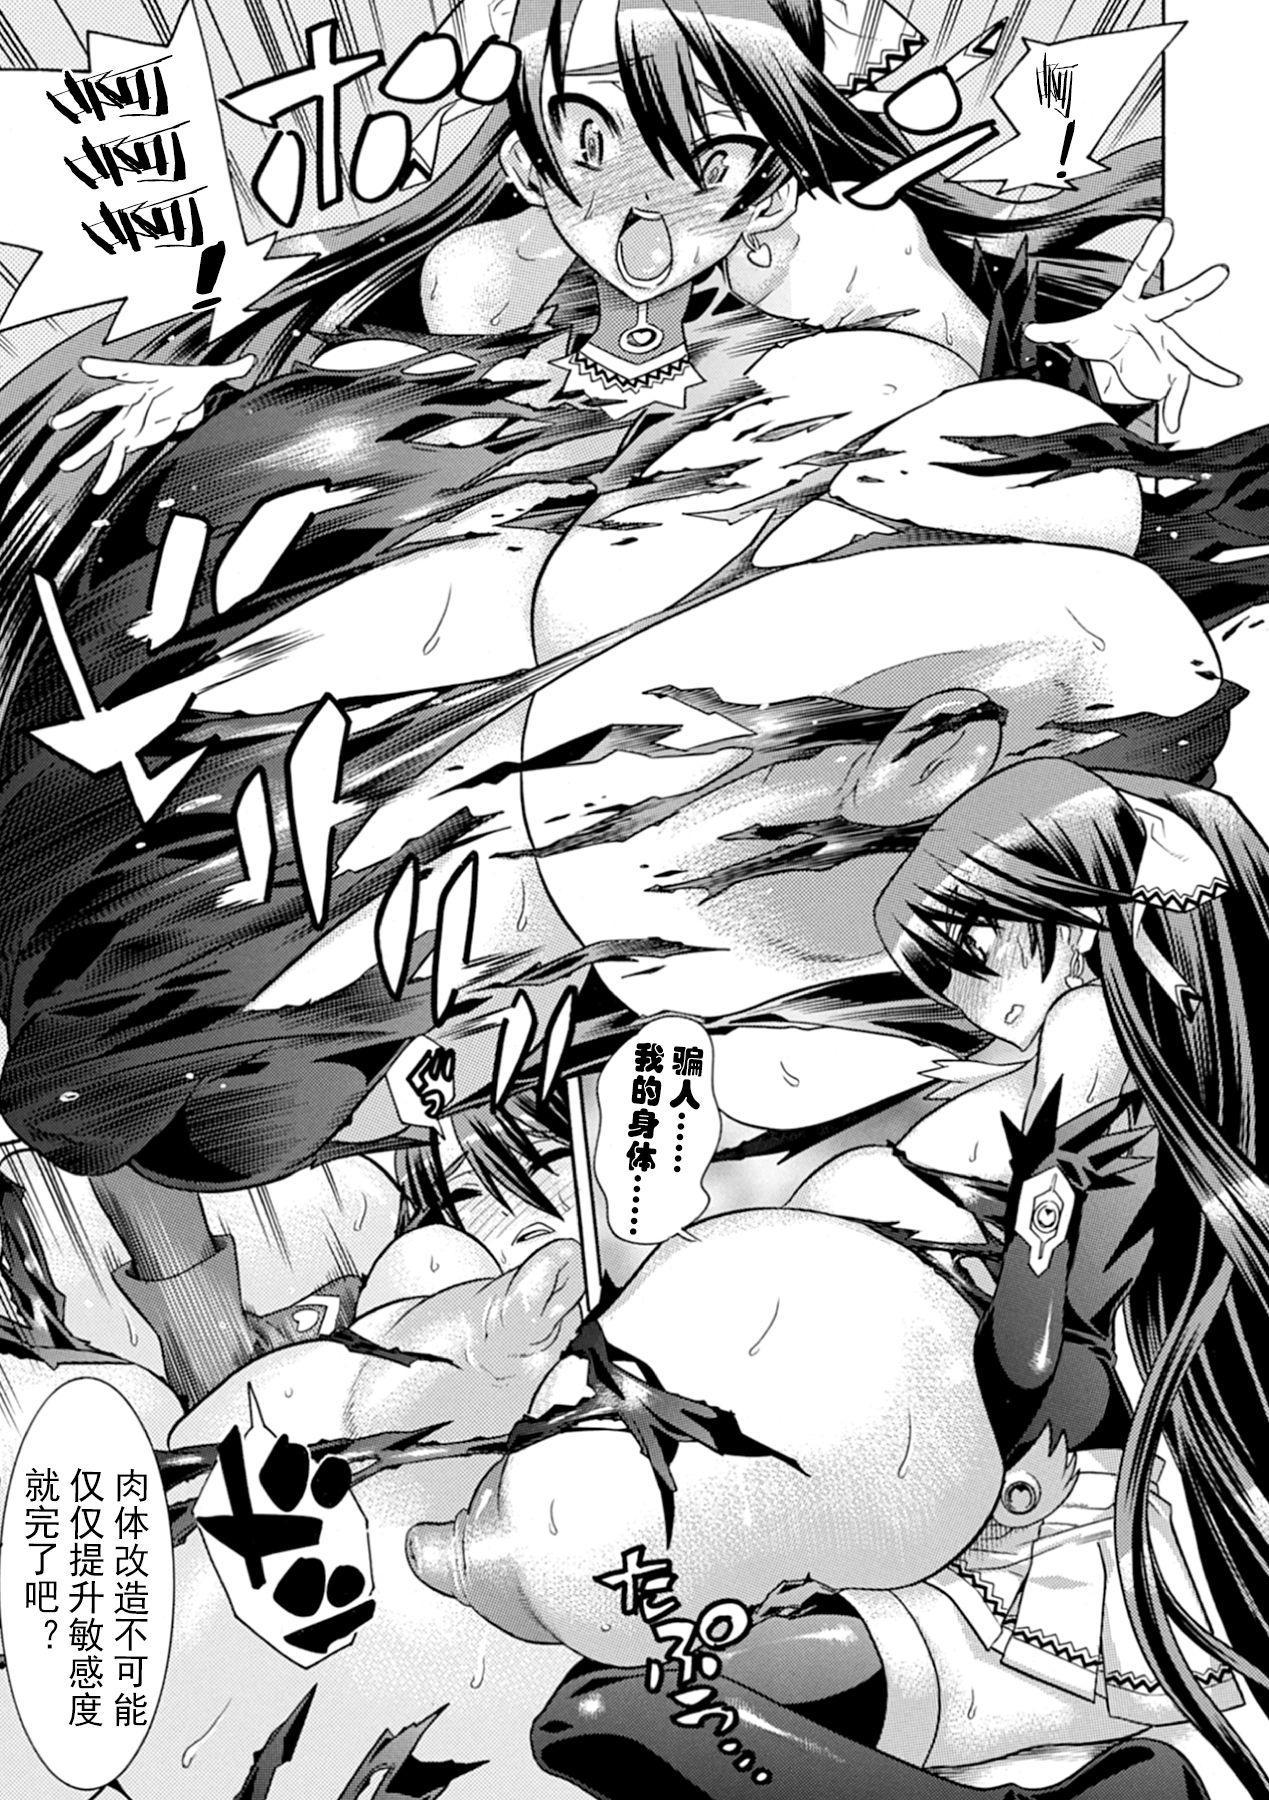 Jintai Kaizou Anthology Comics Vol. 1 31